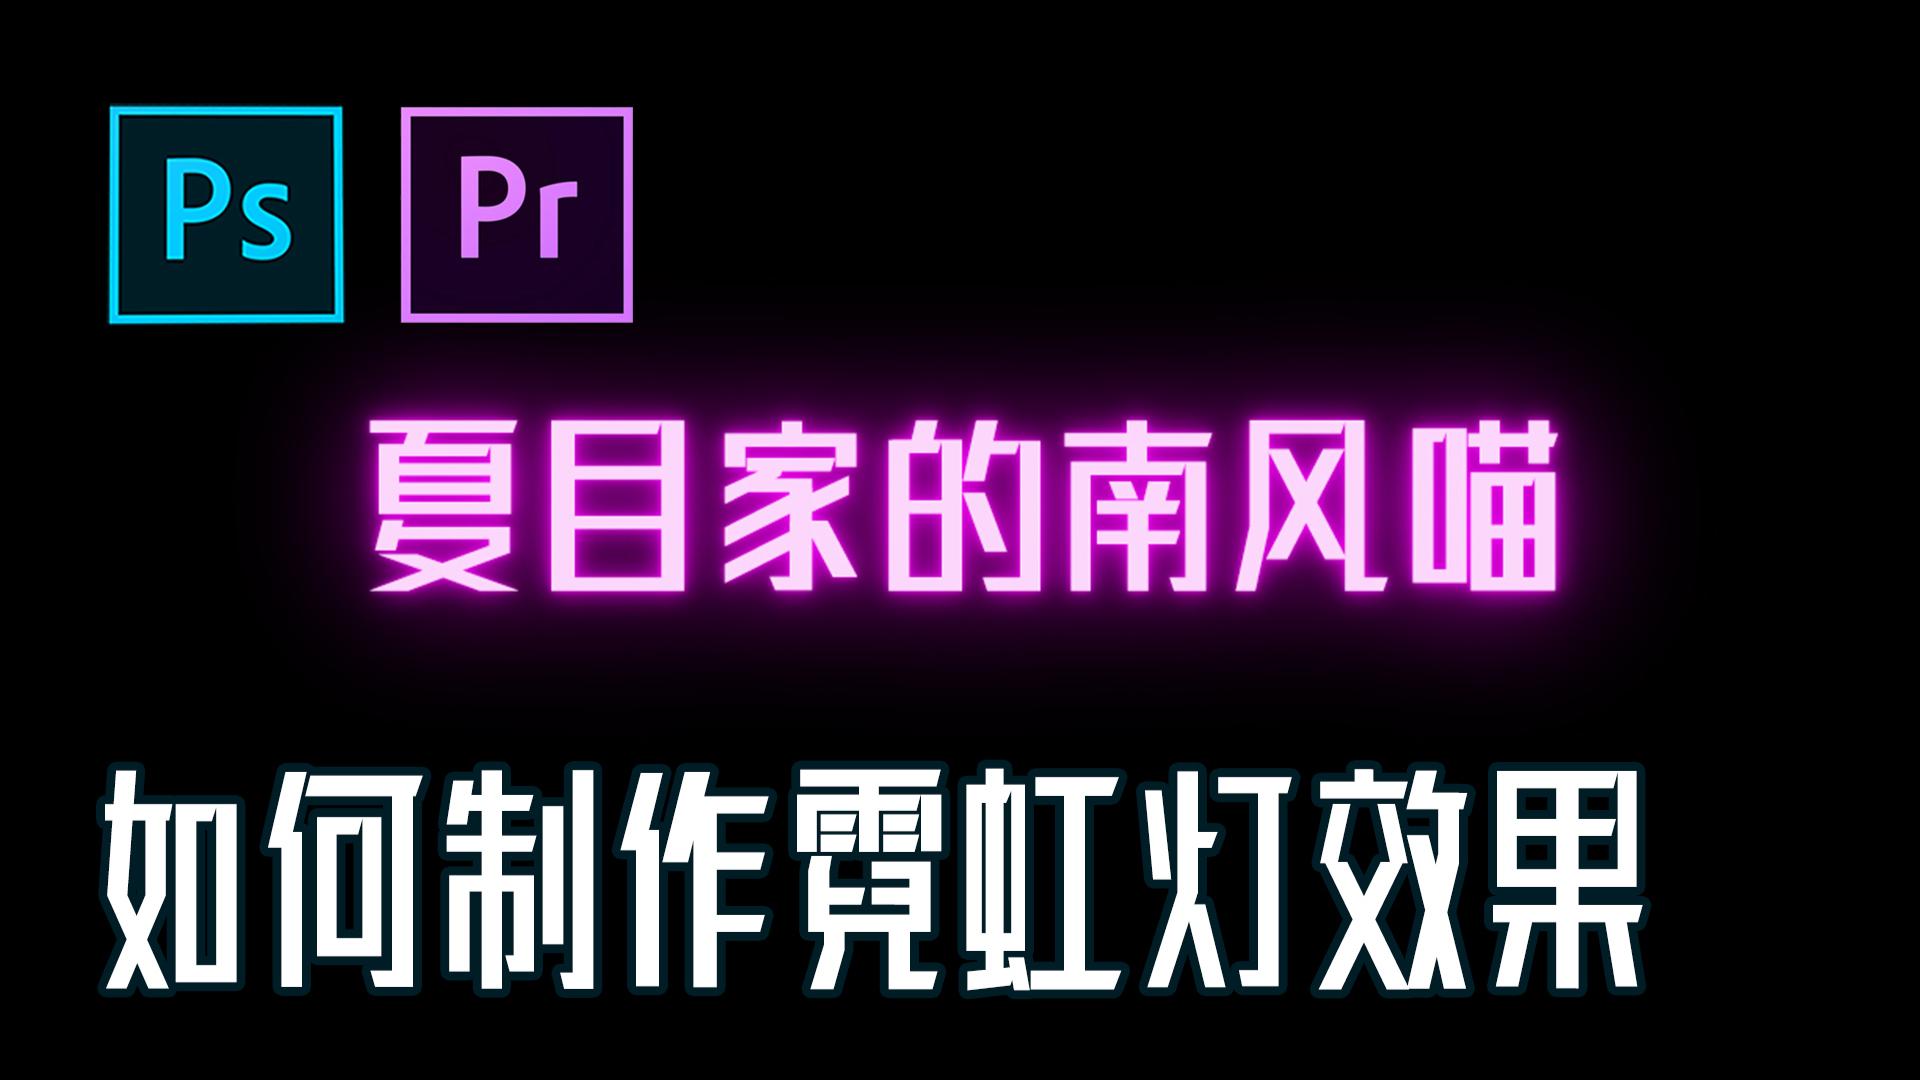 【PS技巧】制作霓虹灯效果